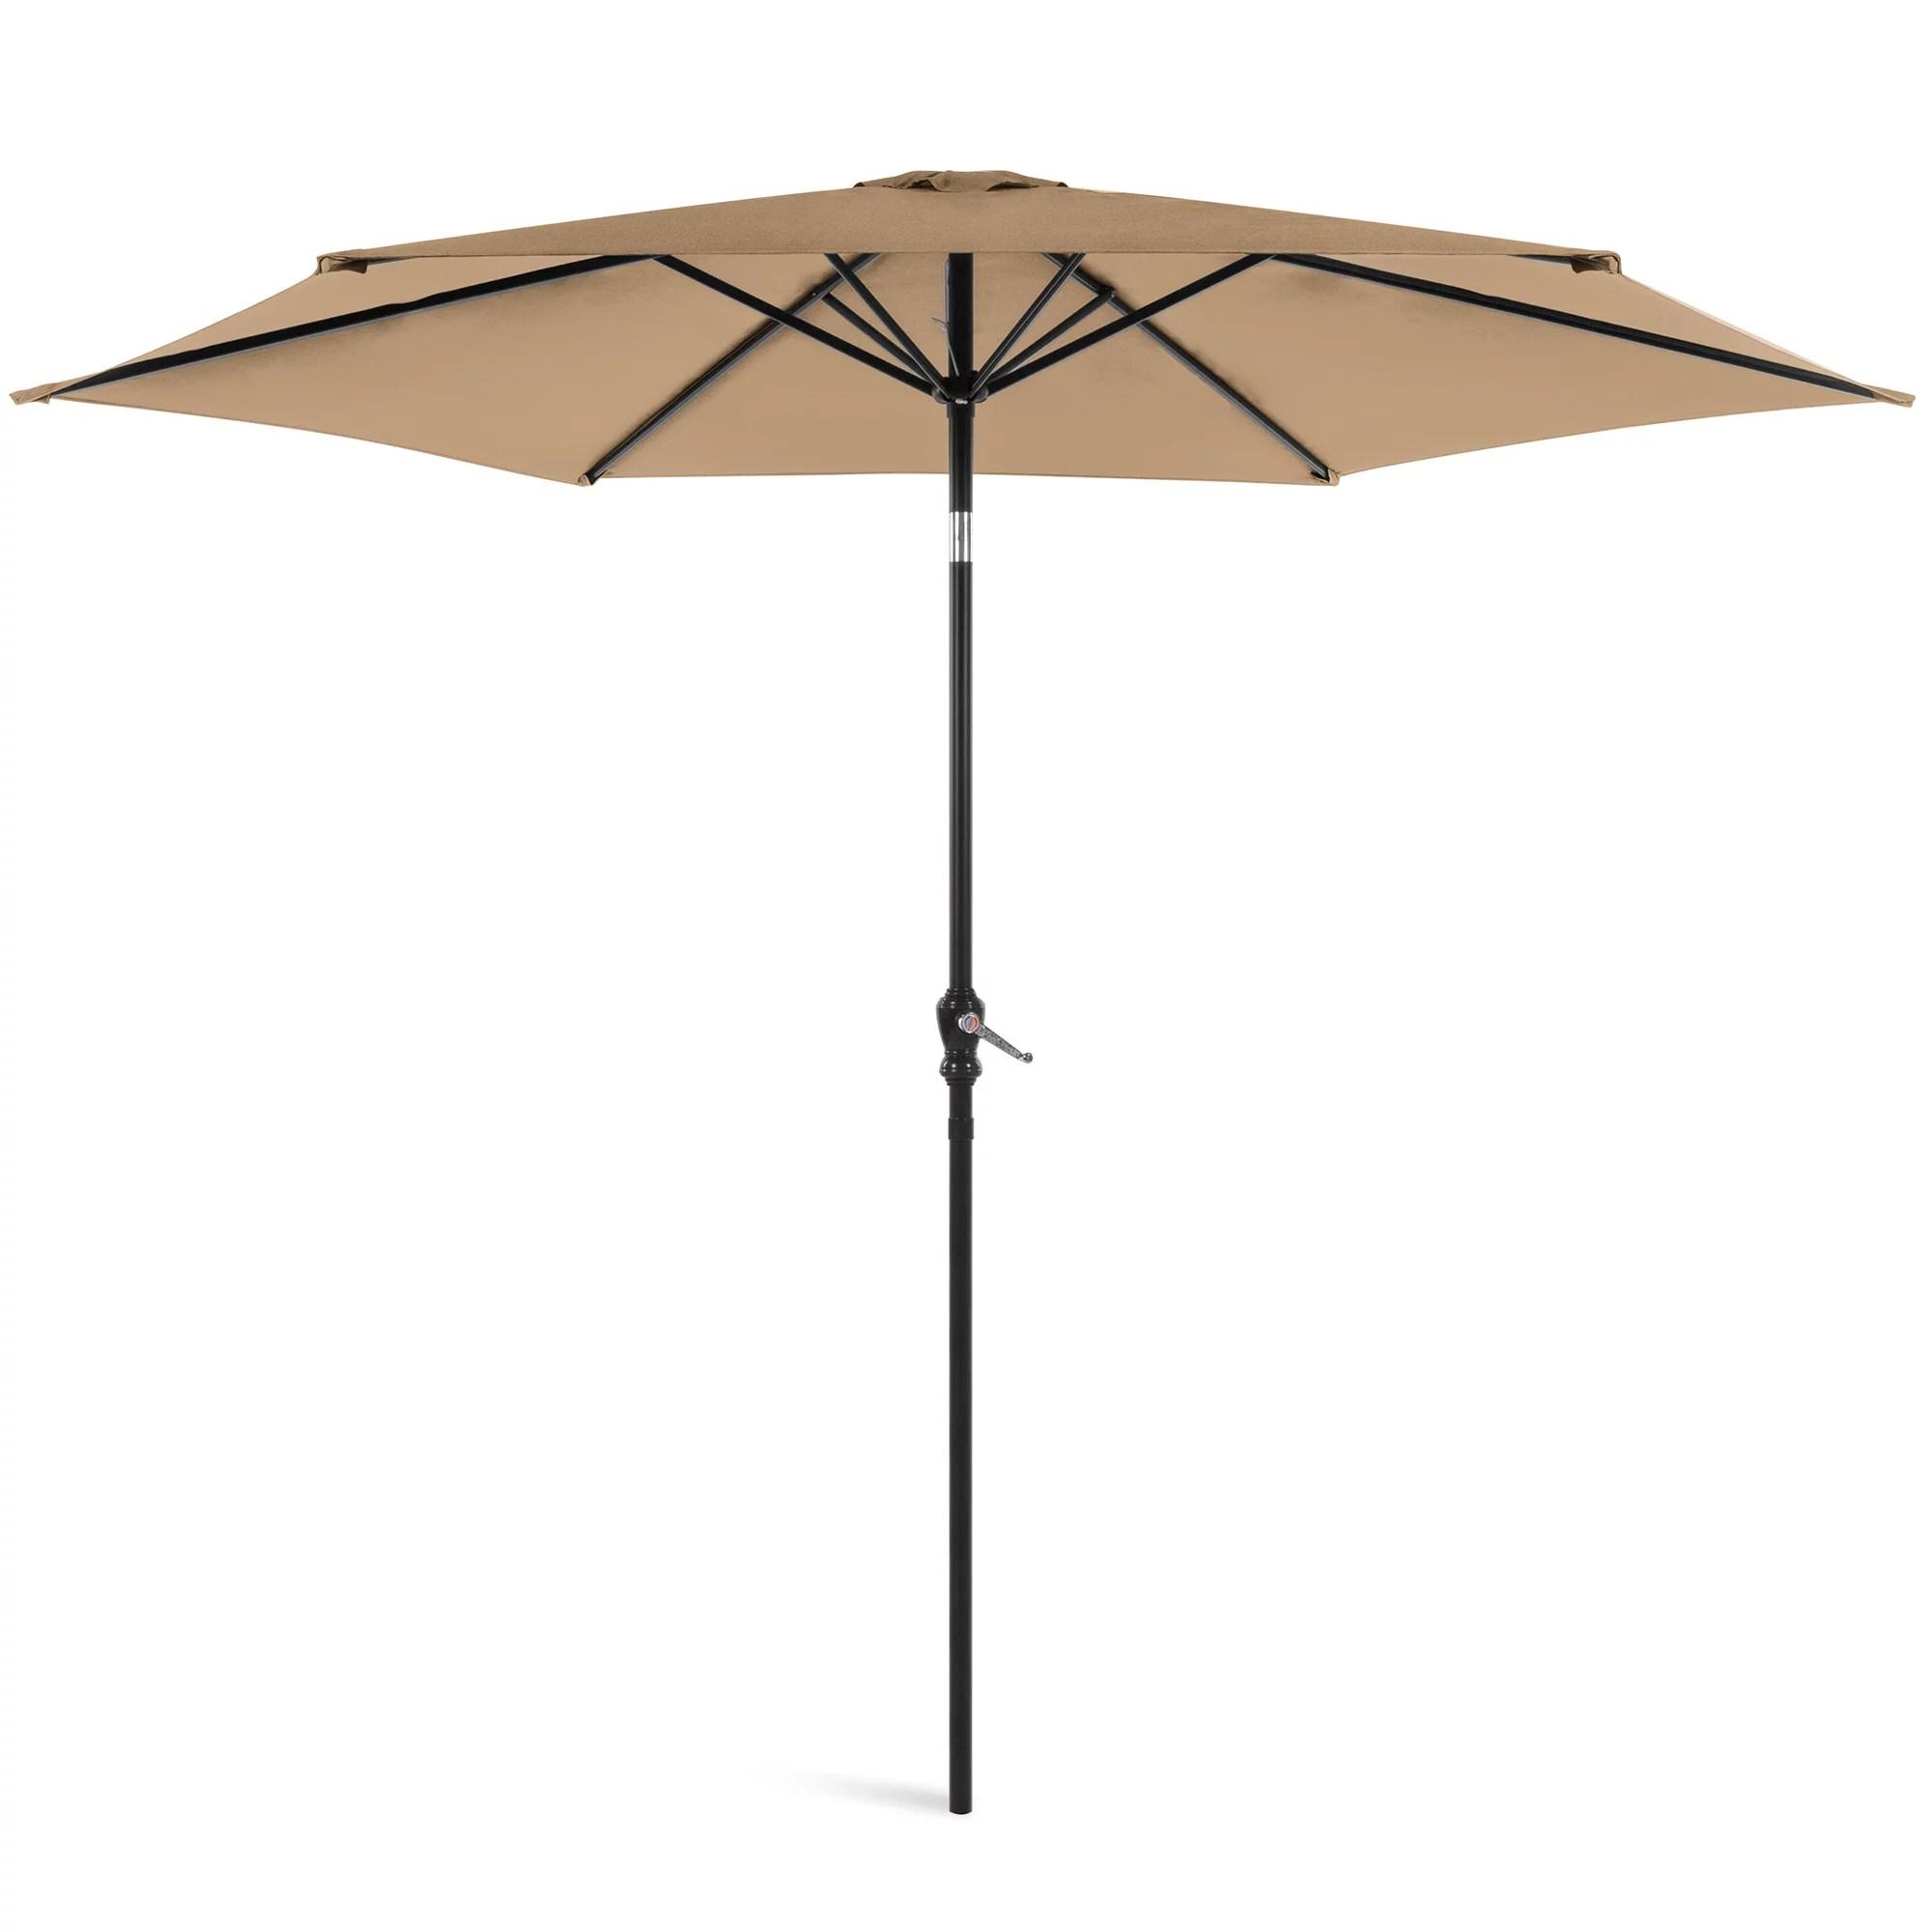 best choice products 10ft outdoor steel market patio umbrella w crank tilt push button 6 ribs tan